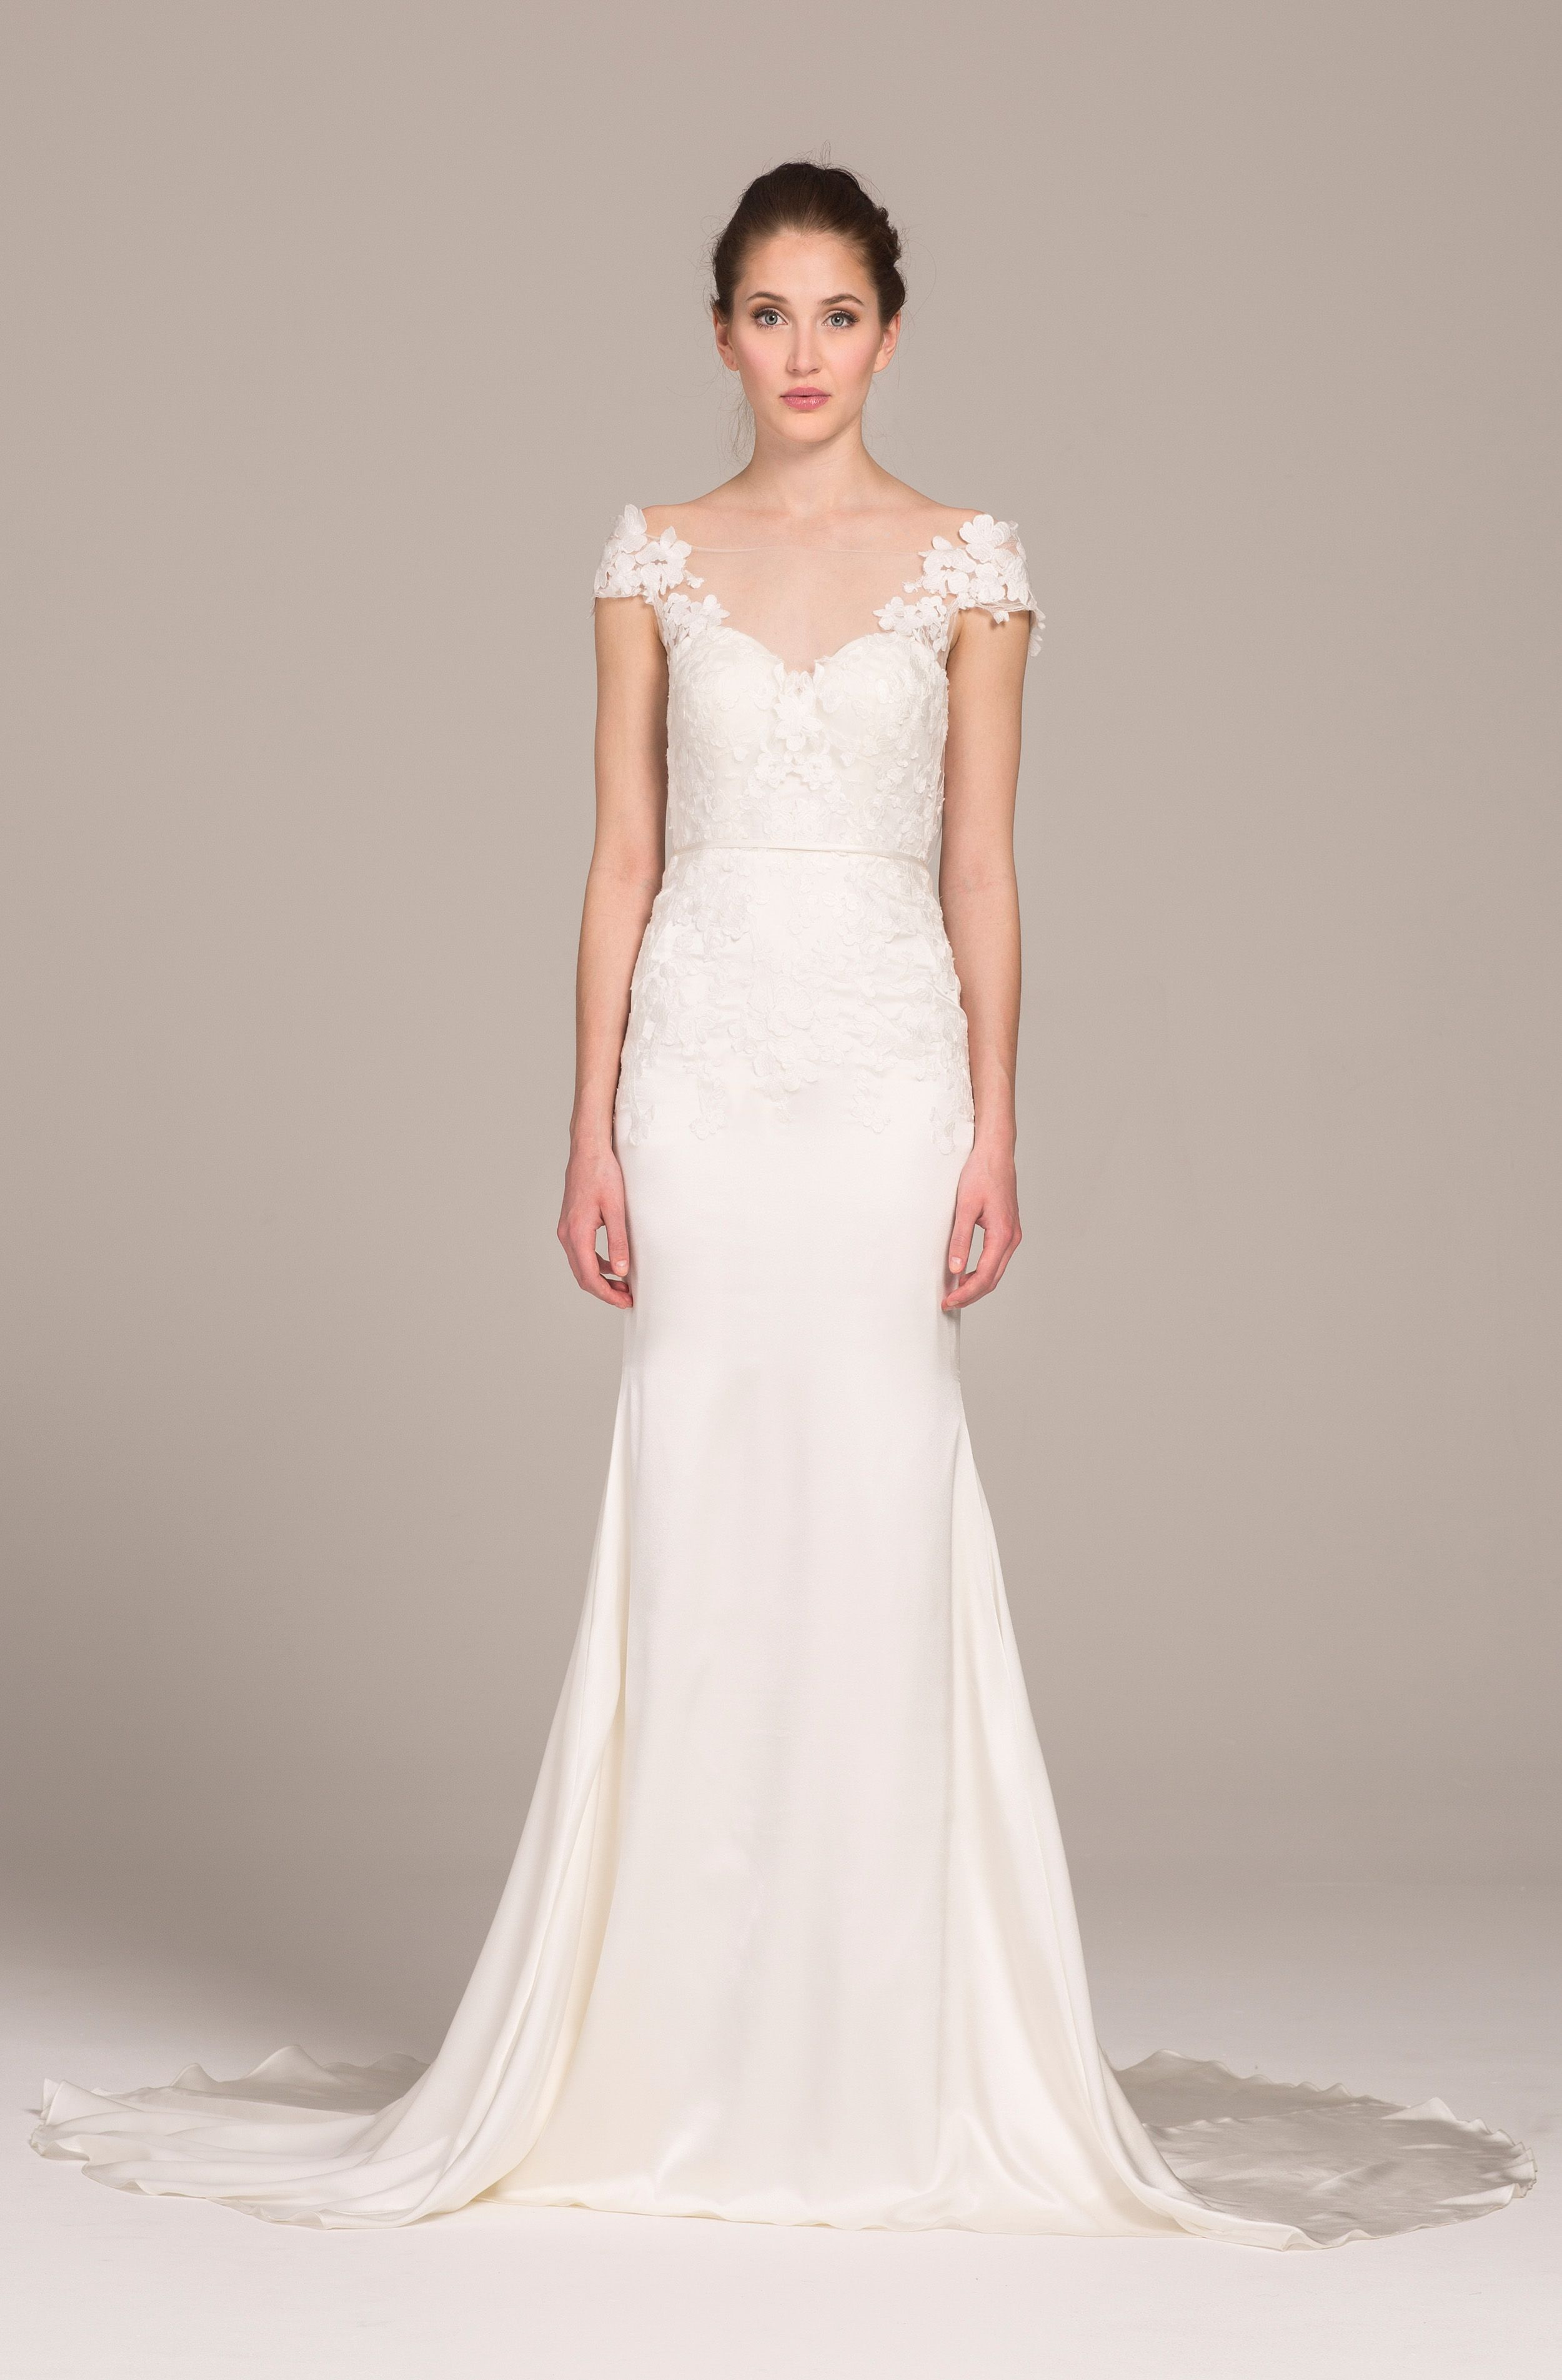 Emilia in the dress pinterest wedding wedding dresses